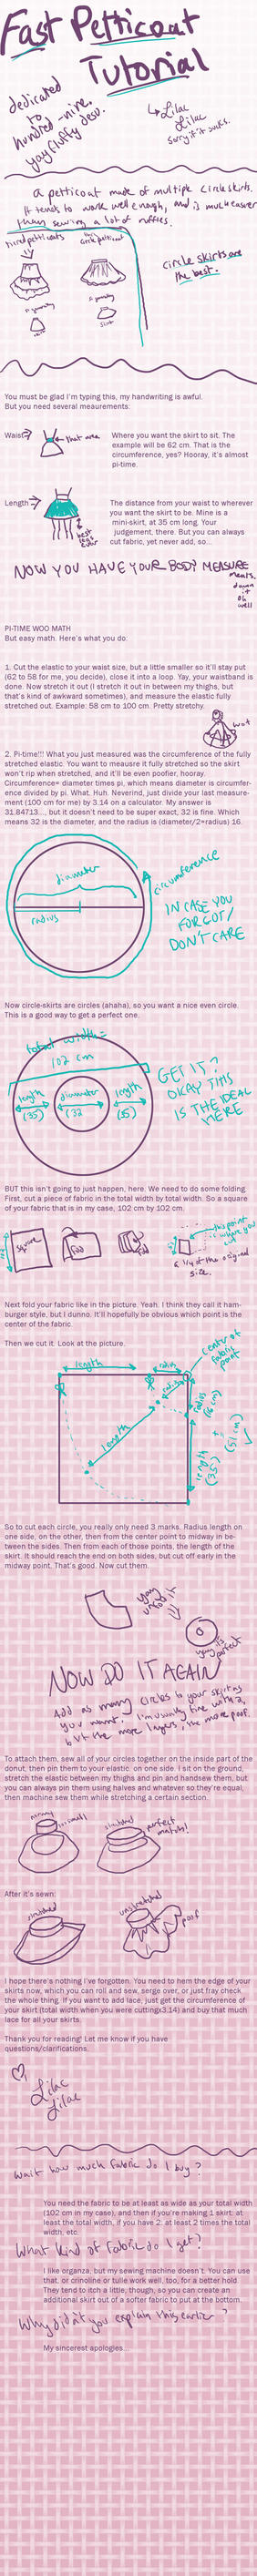 Fast Petticoat Tutorial: Pi!! by LilacLilac